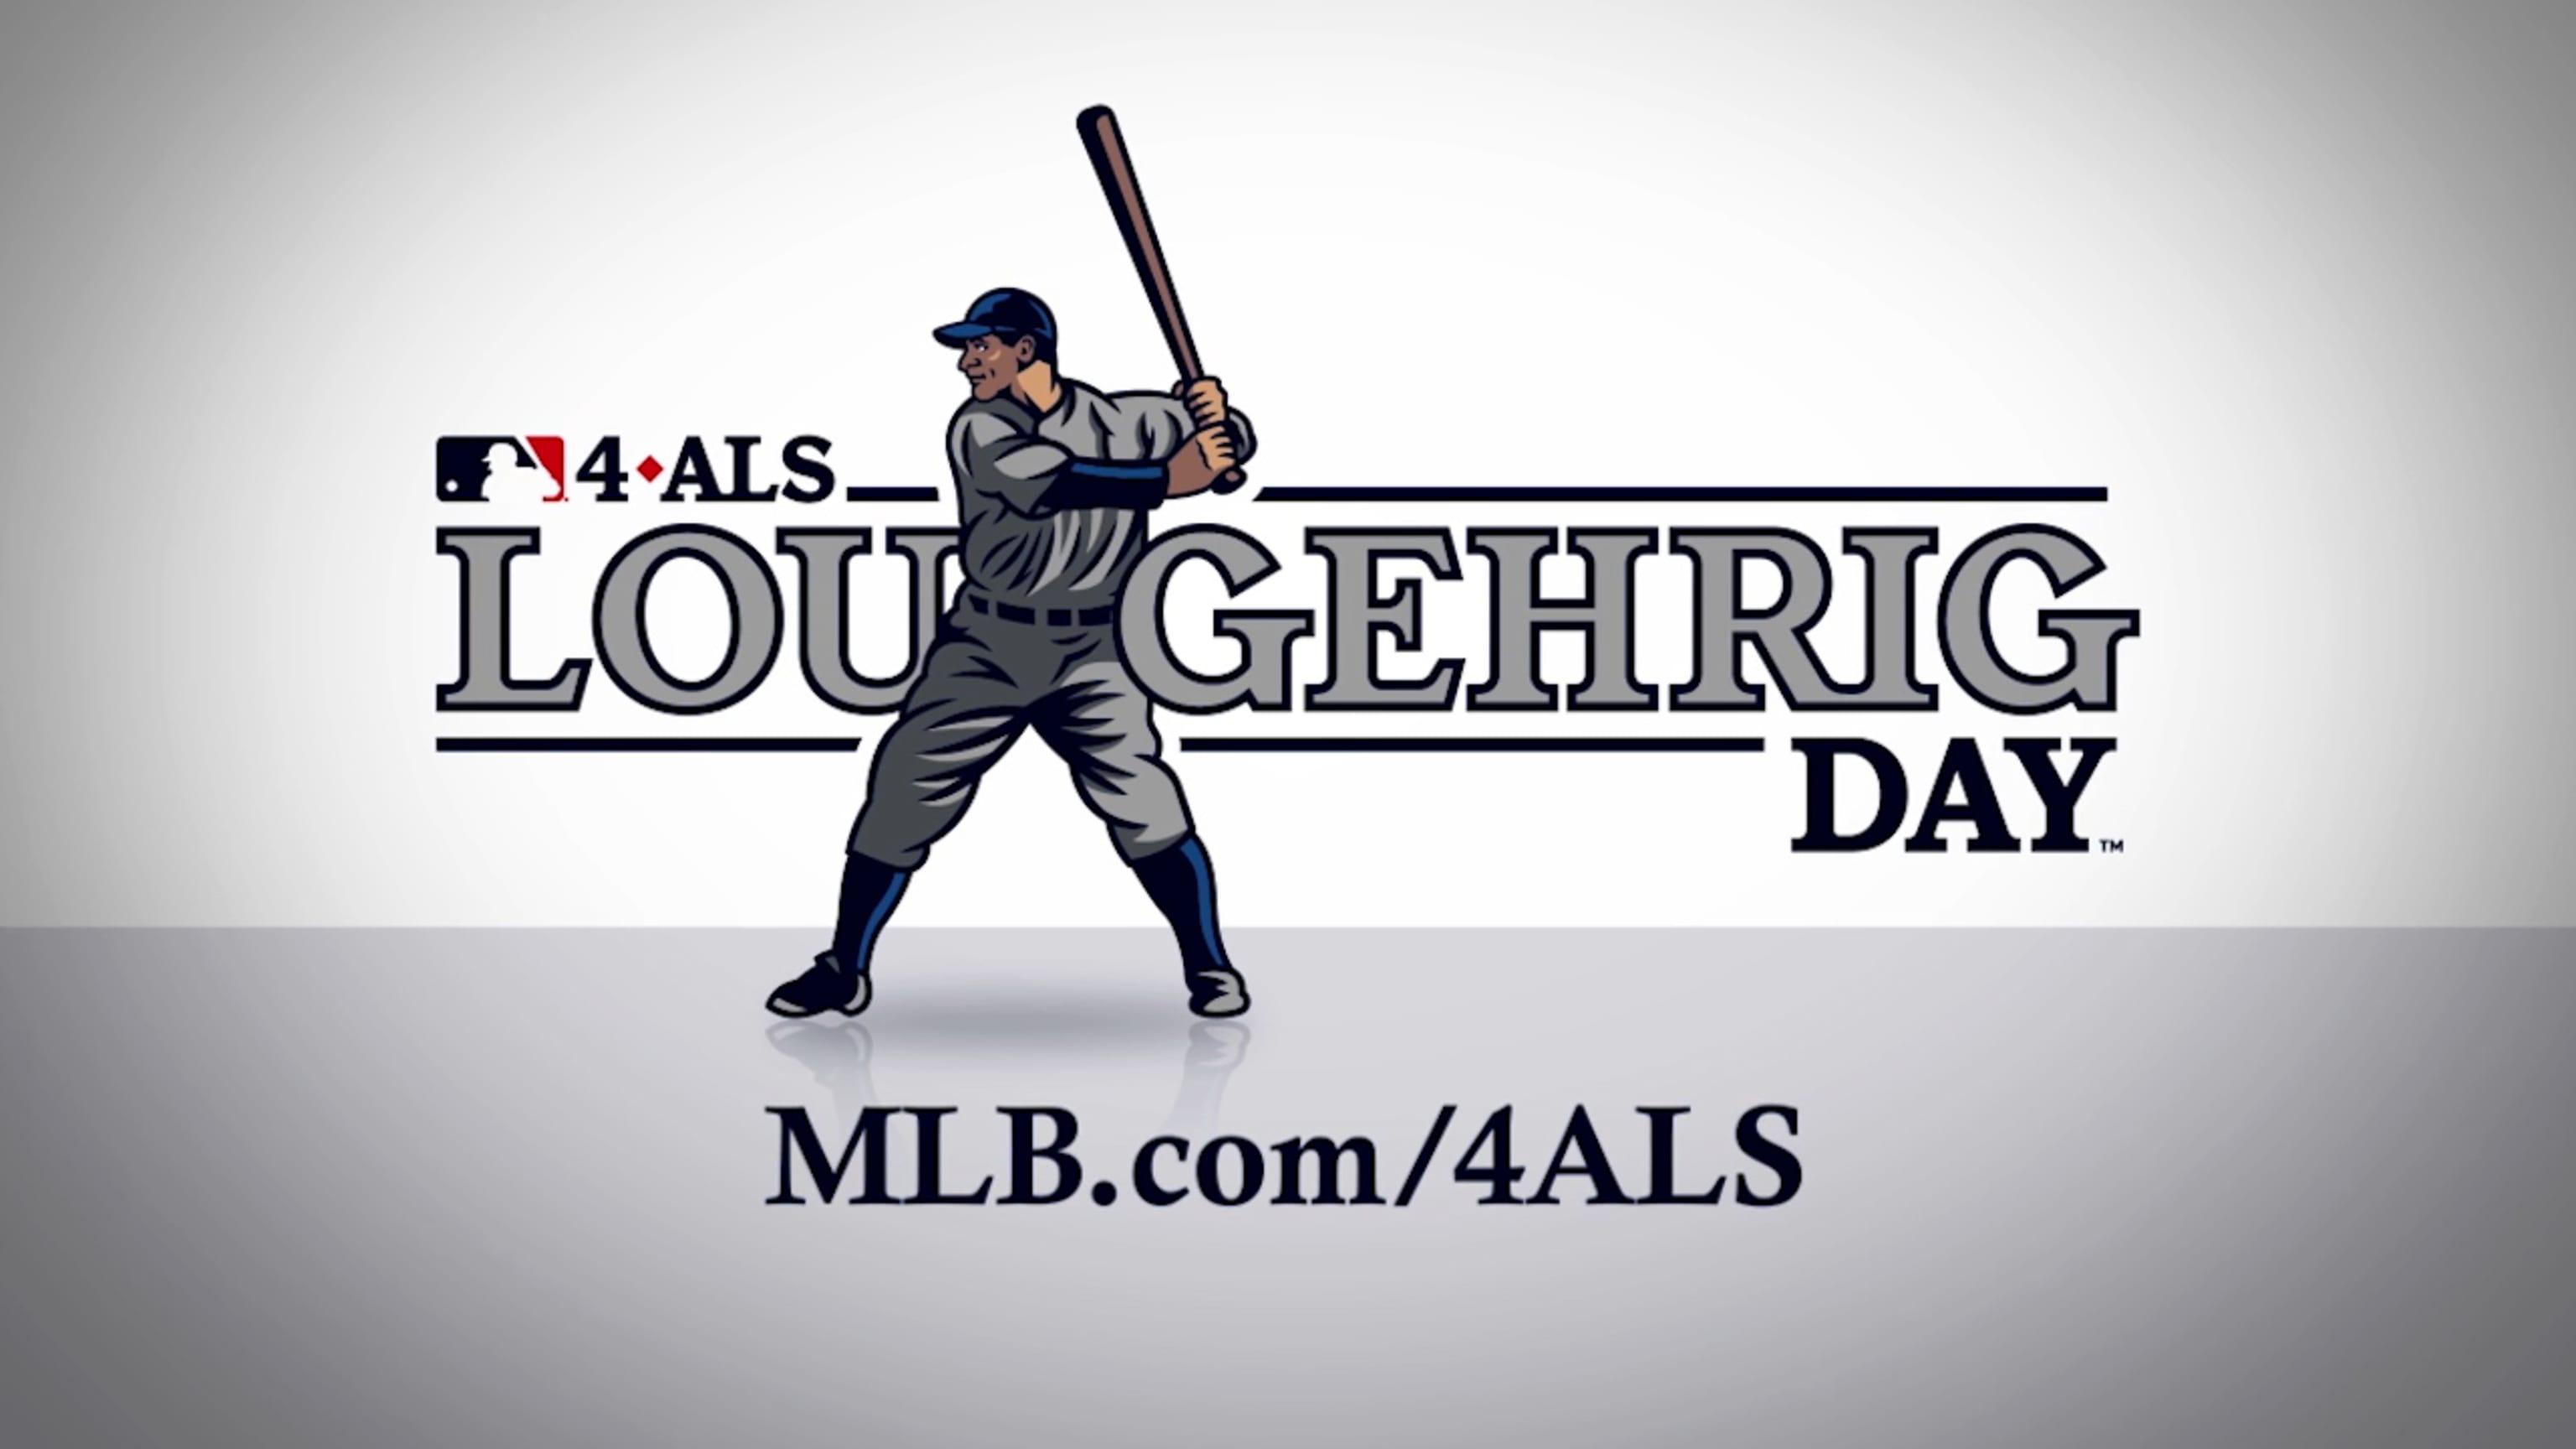 Inaugural Lou Gehrig Day